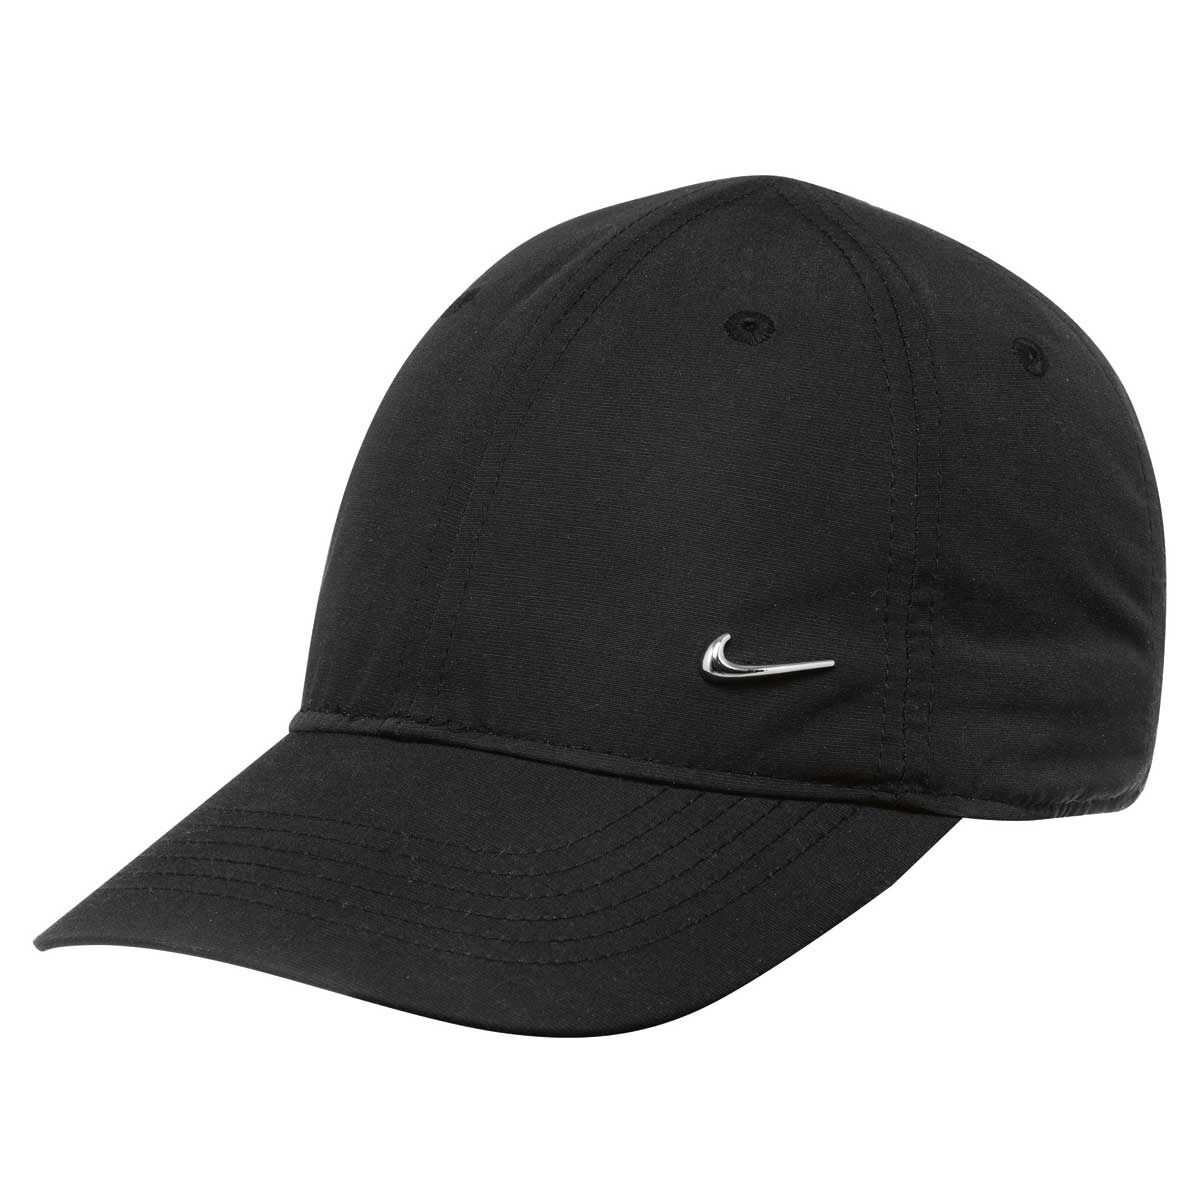 Nike Boys Heritage 86 Metal Swoosh Cap Black OSFA